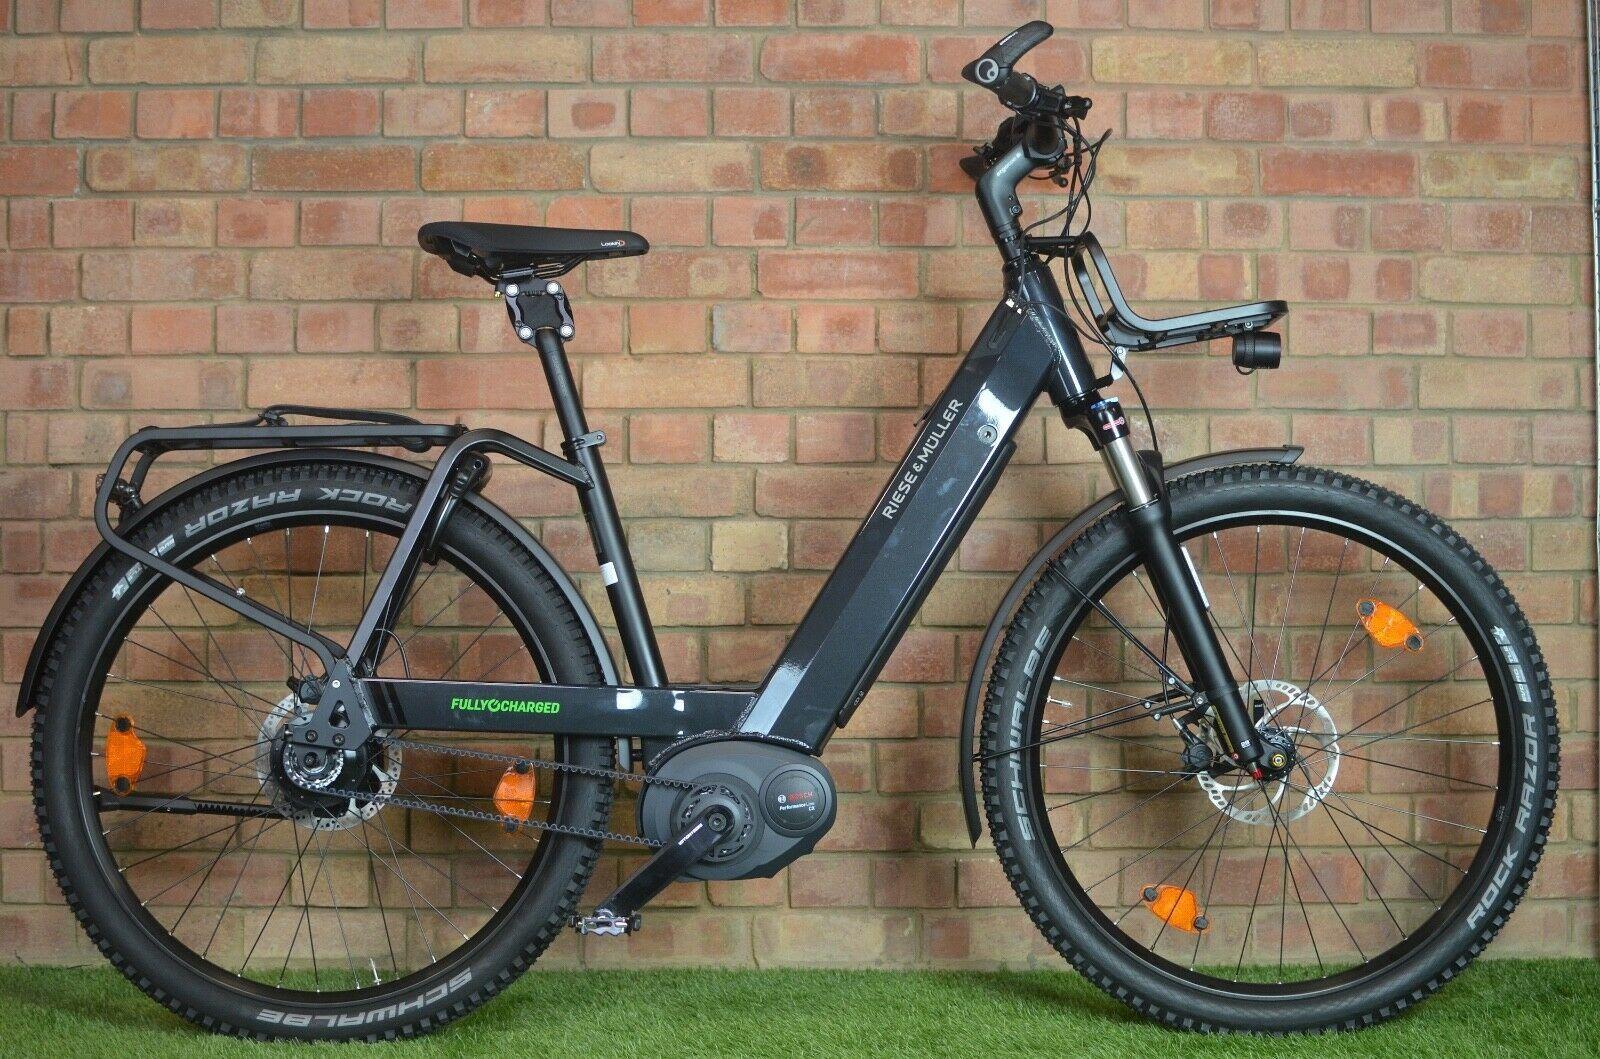 Riese Muller Nevo Gx Rohloff Electric Bike Ebike Electric Bikes For Sale Electric Bike Bike